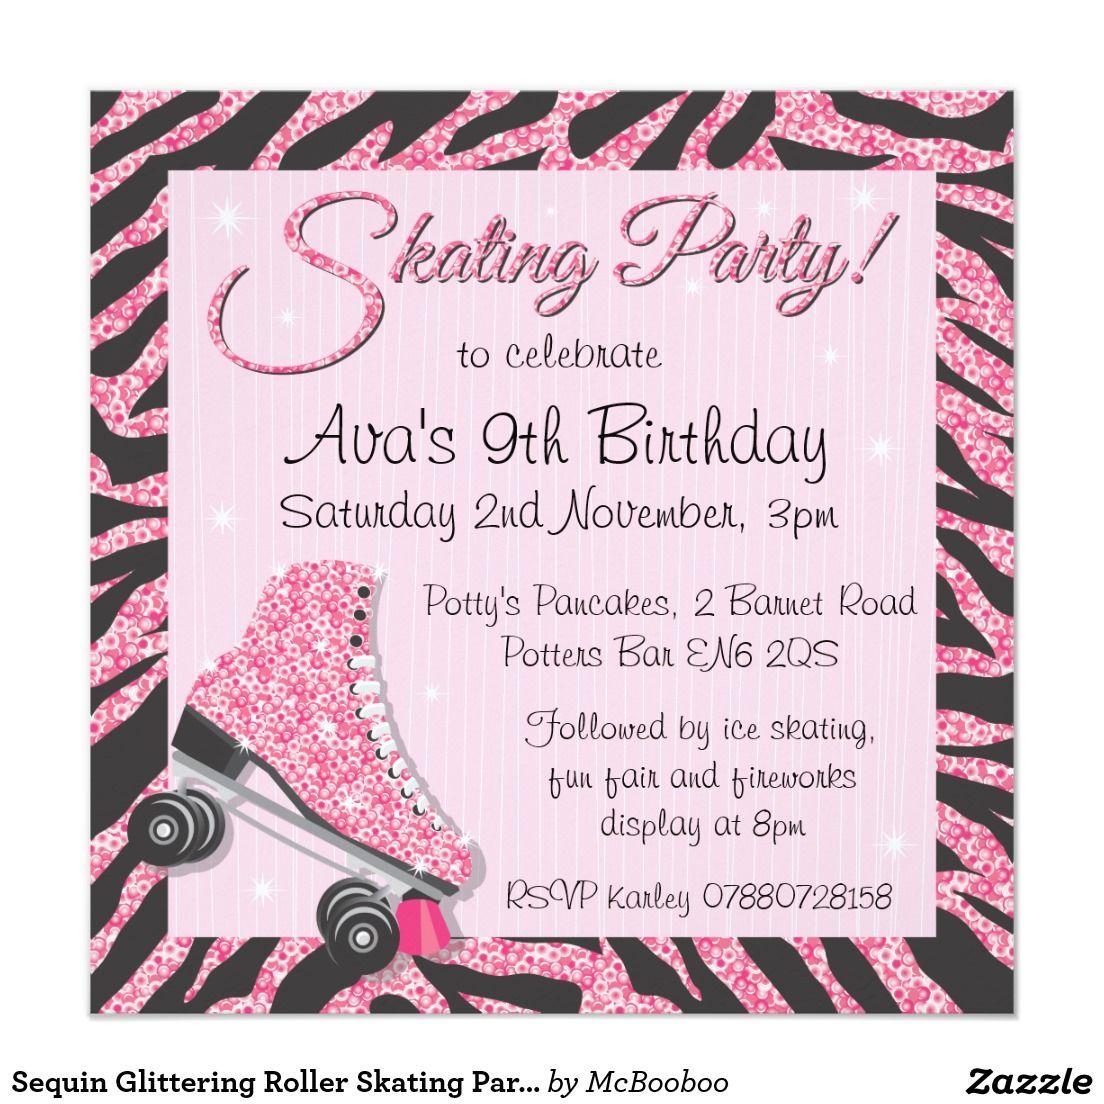 Sequin Glittering Roller Skating Party Invitations | Bachelorette ...